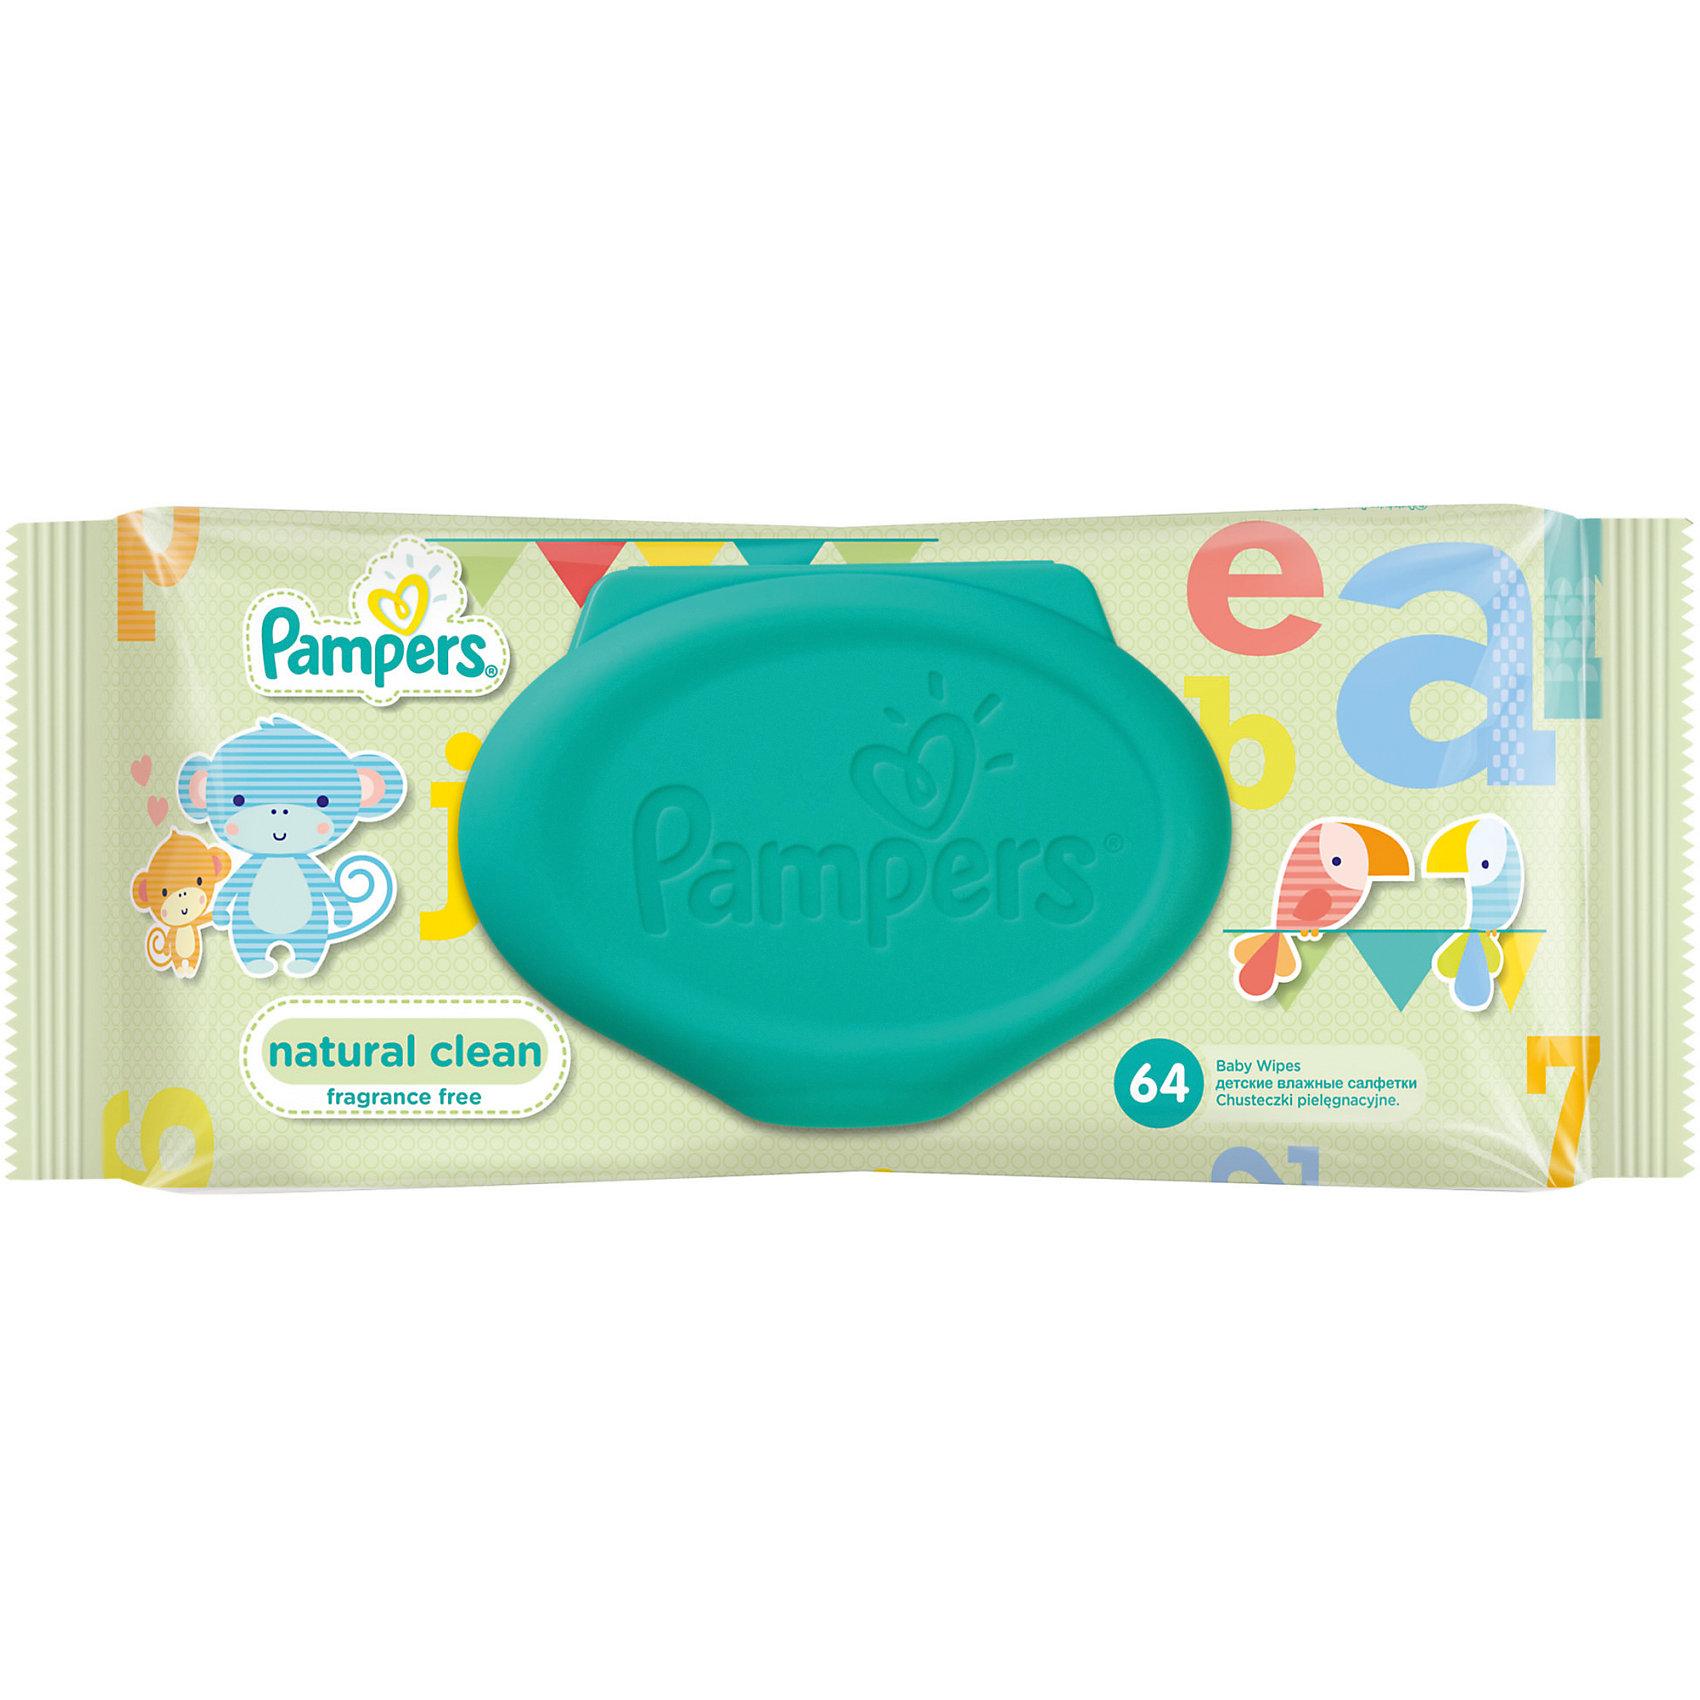 Салфетки детские влажные Pampers  Natural Clean, 64 шт., Pampers (-)